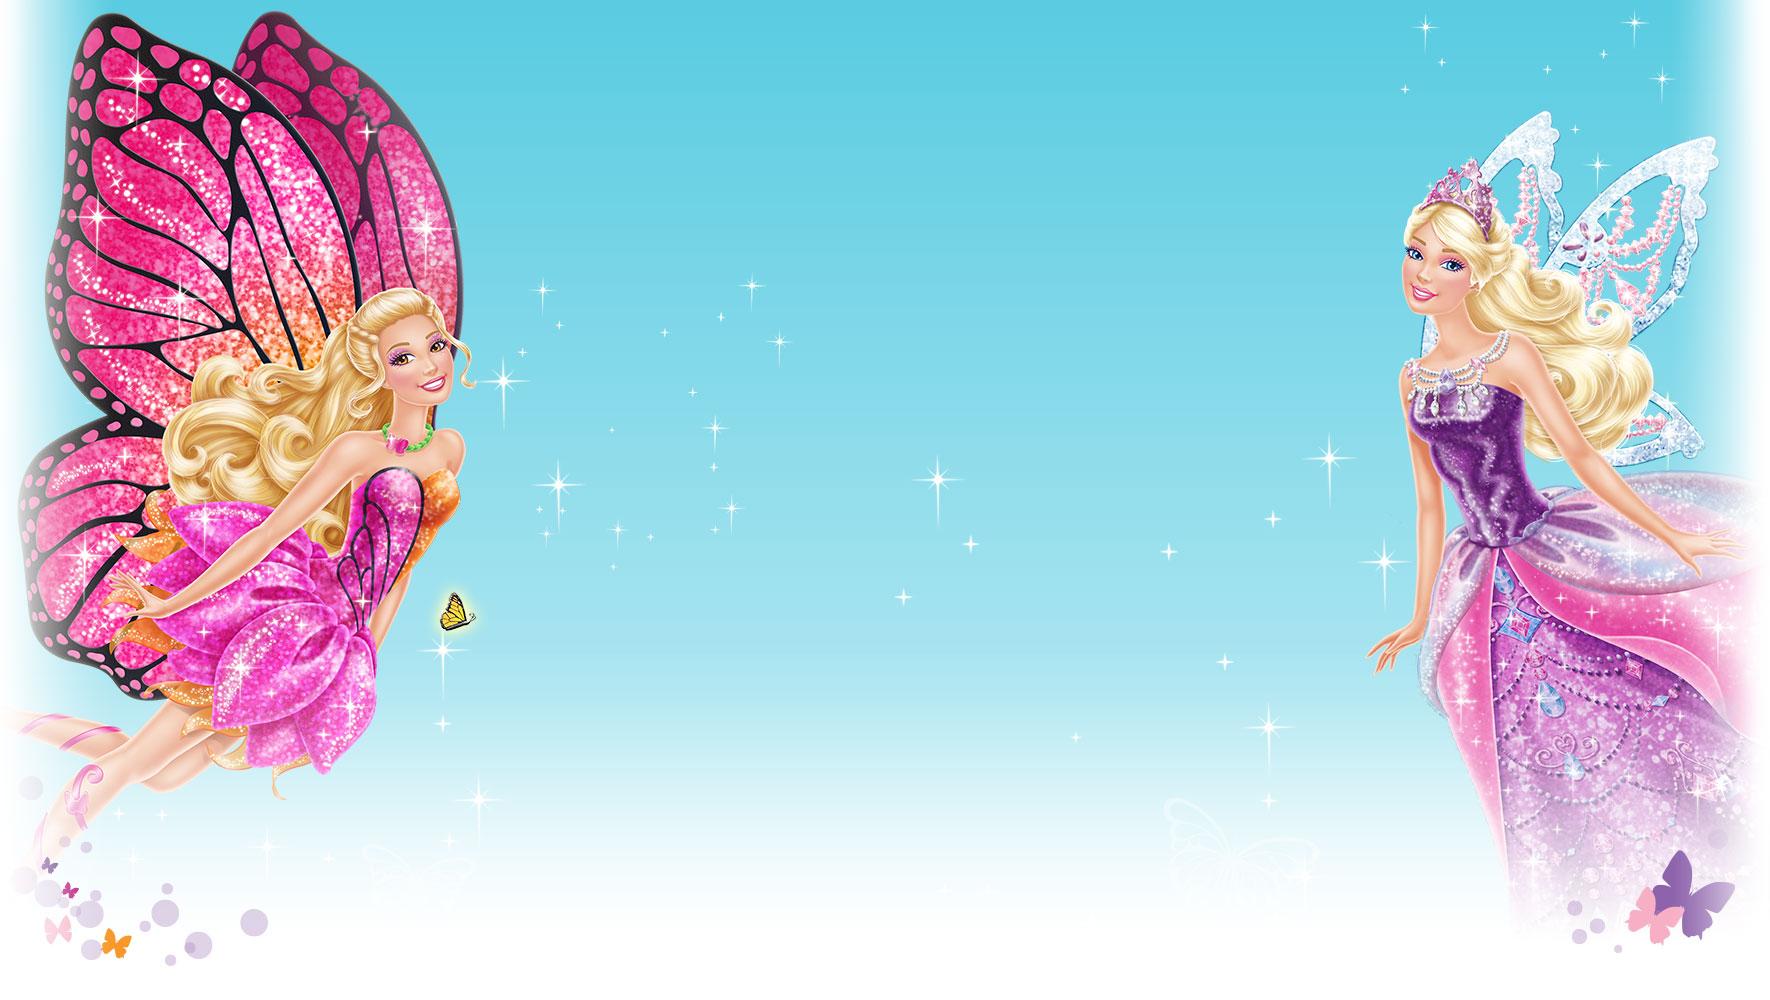 Cute Pari Doll Wallpapers Barbie Mariposa Amp The Fairy Princess Barbie Movies Photo